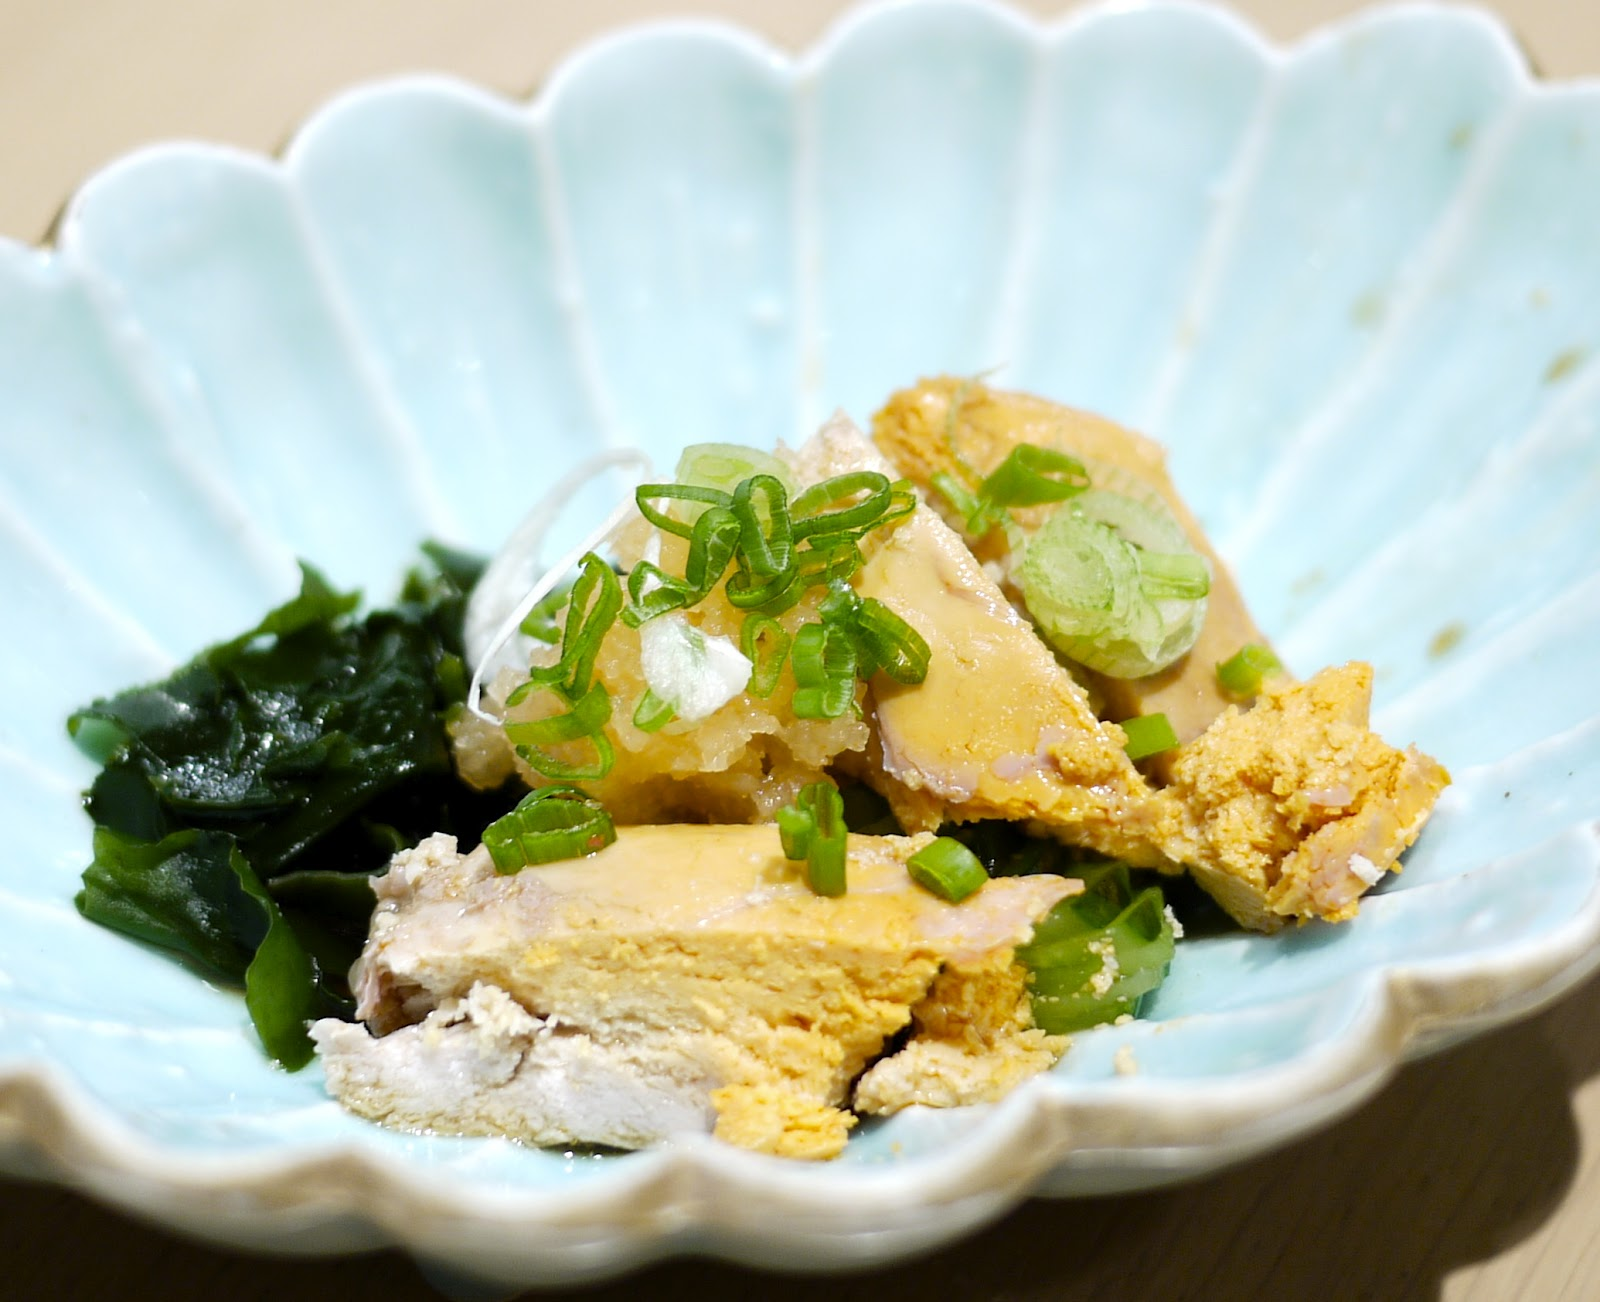 Ankimo Ponzu (RM13) - Monk fish liver served with ponzu sauce was ...